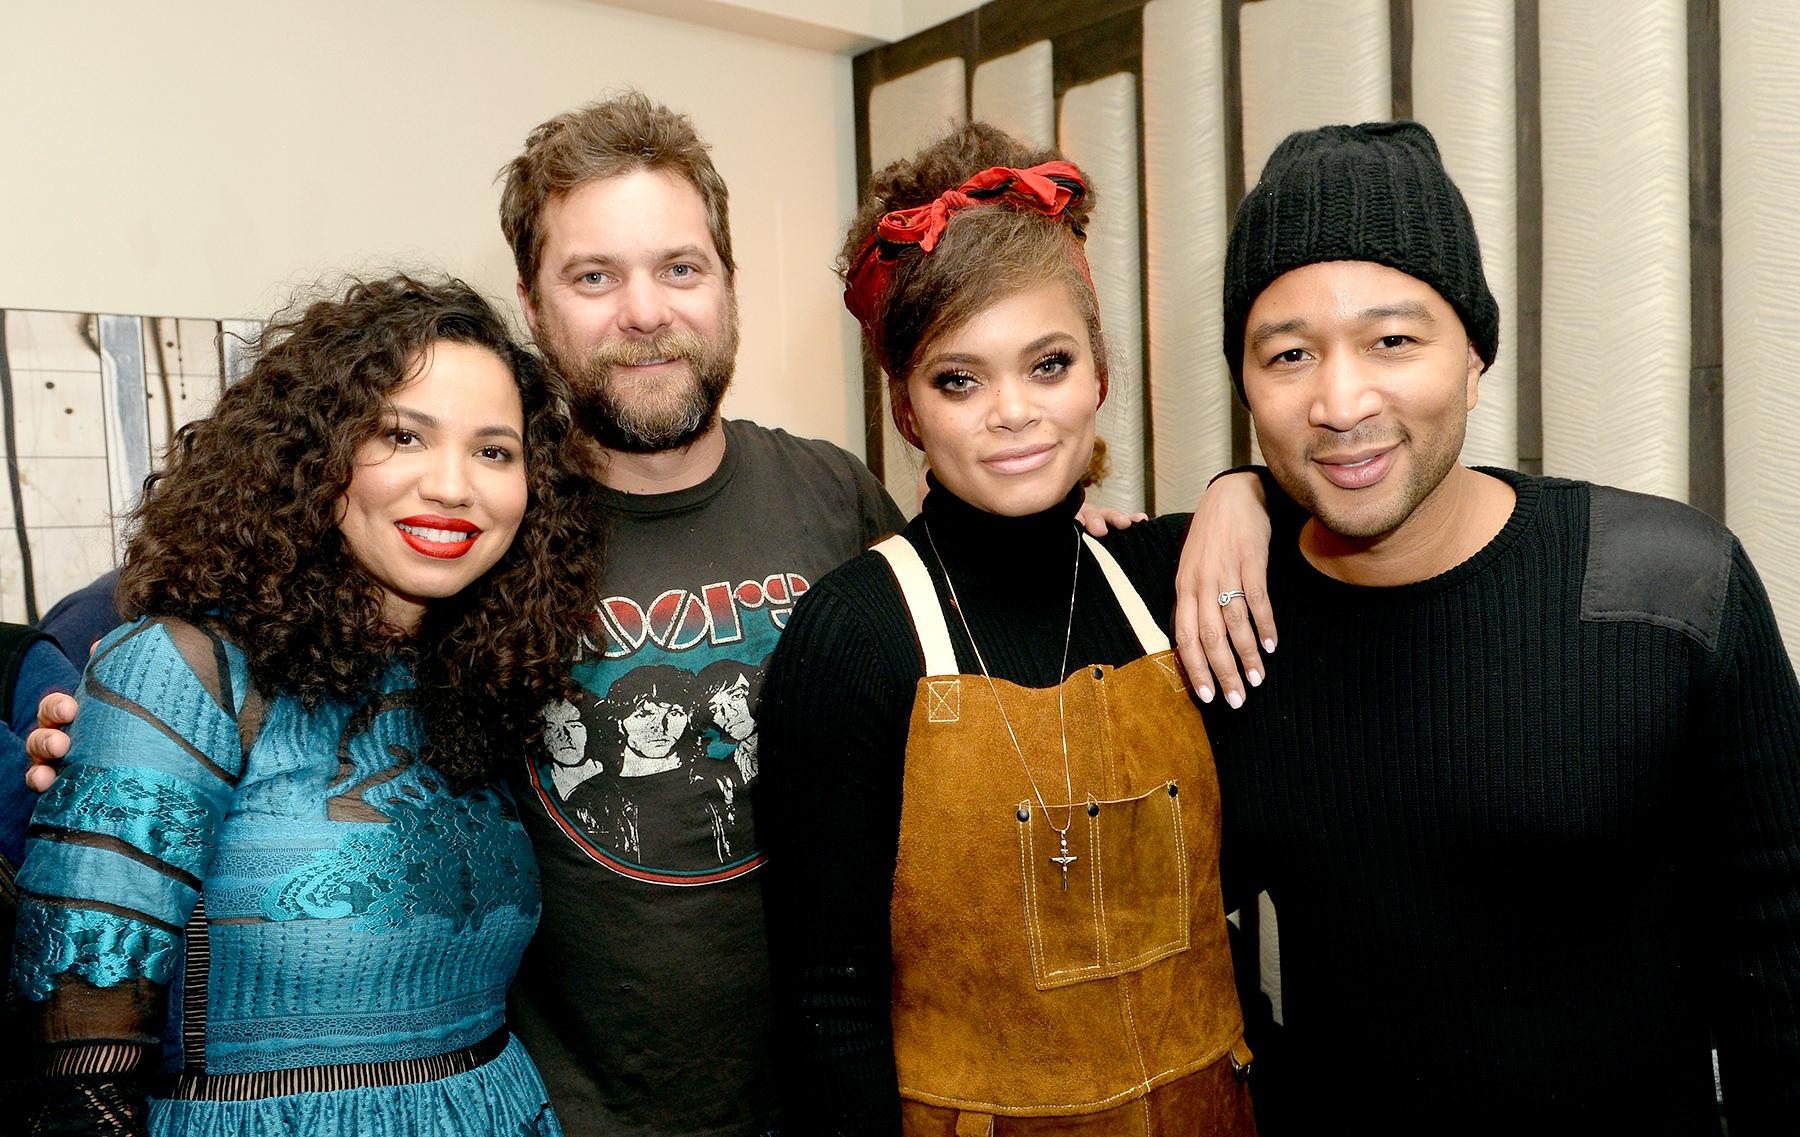 Jurnee Smollett-Bell, Joshua Jackson, Andra Day, and John Legend attend WGN America's